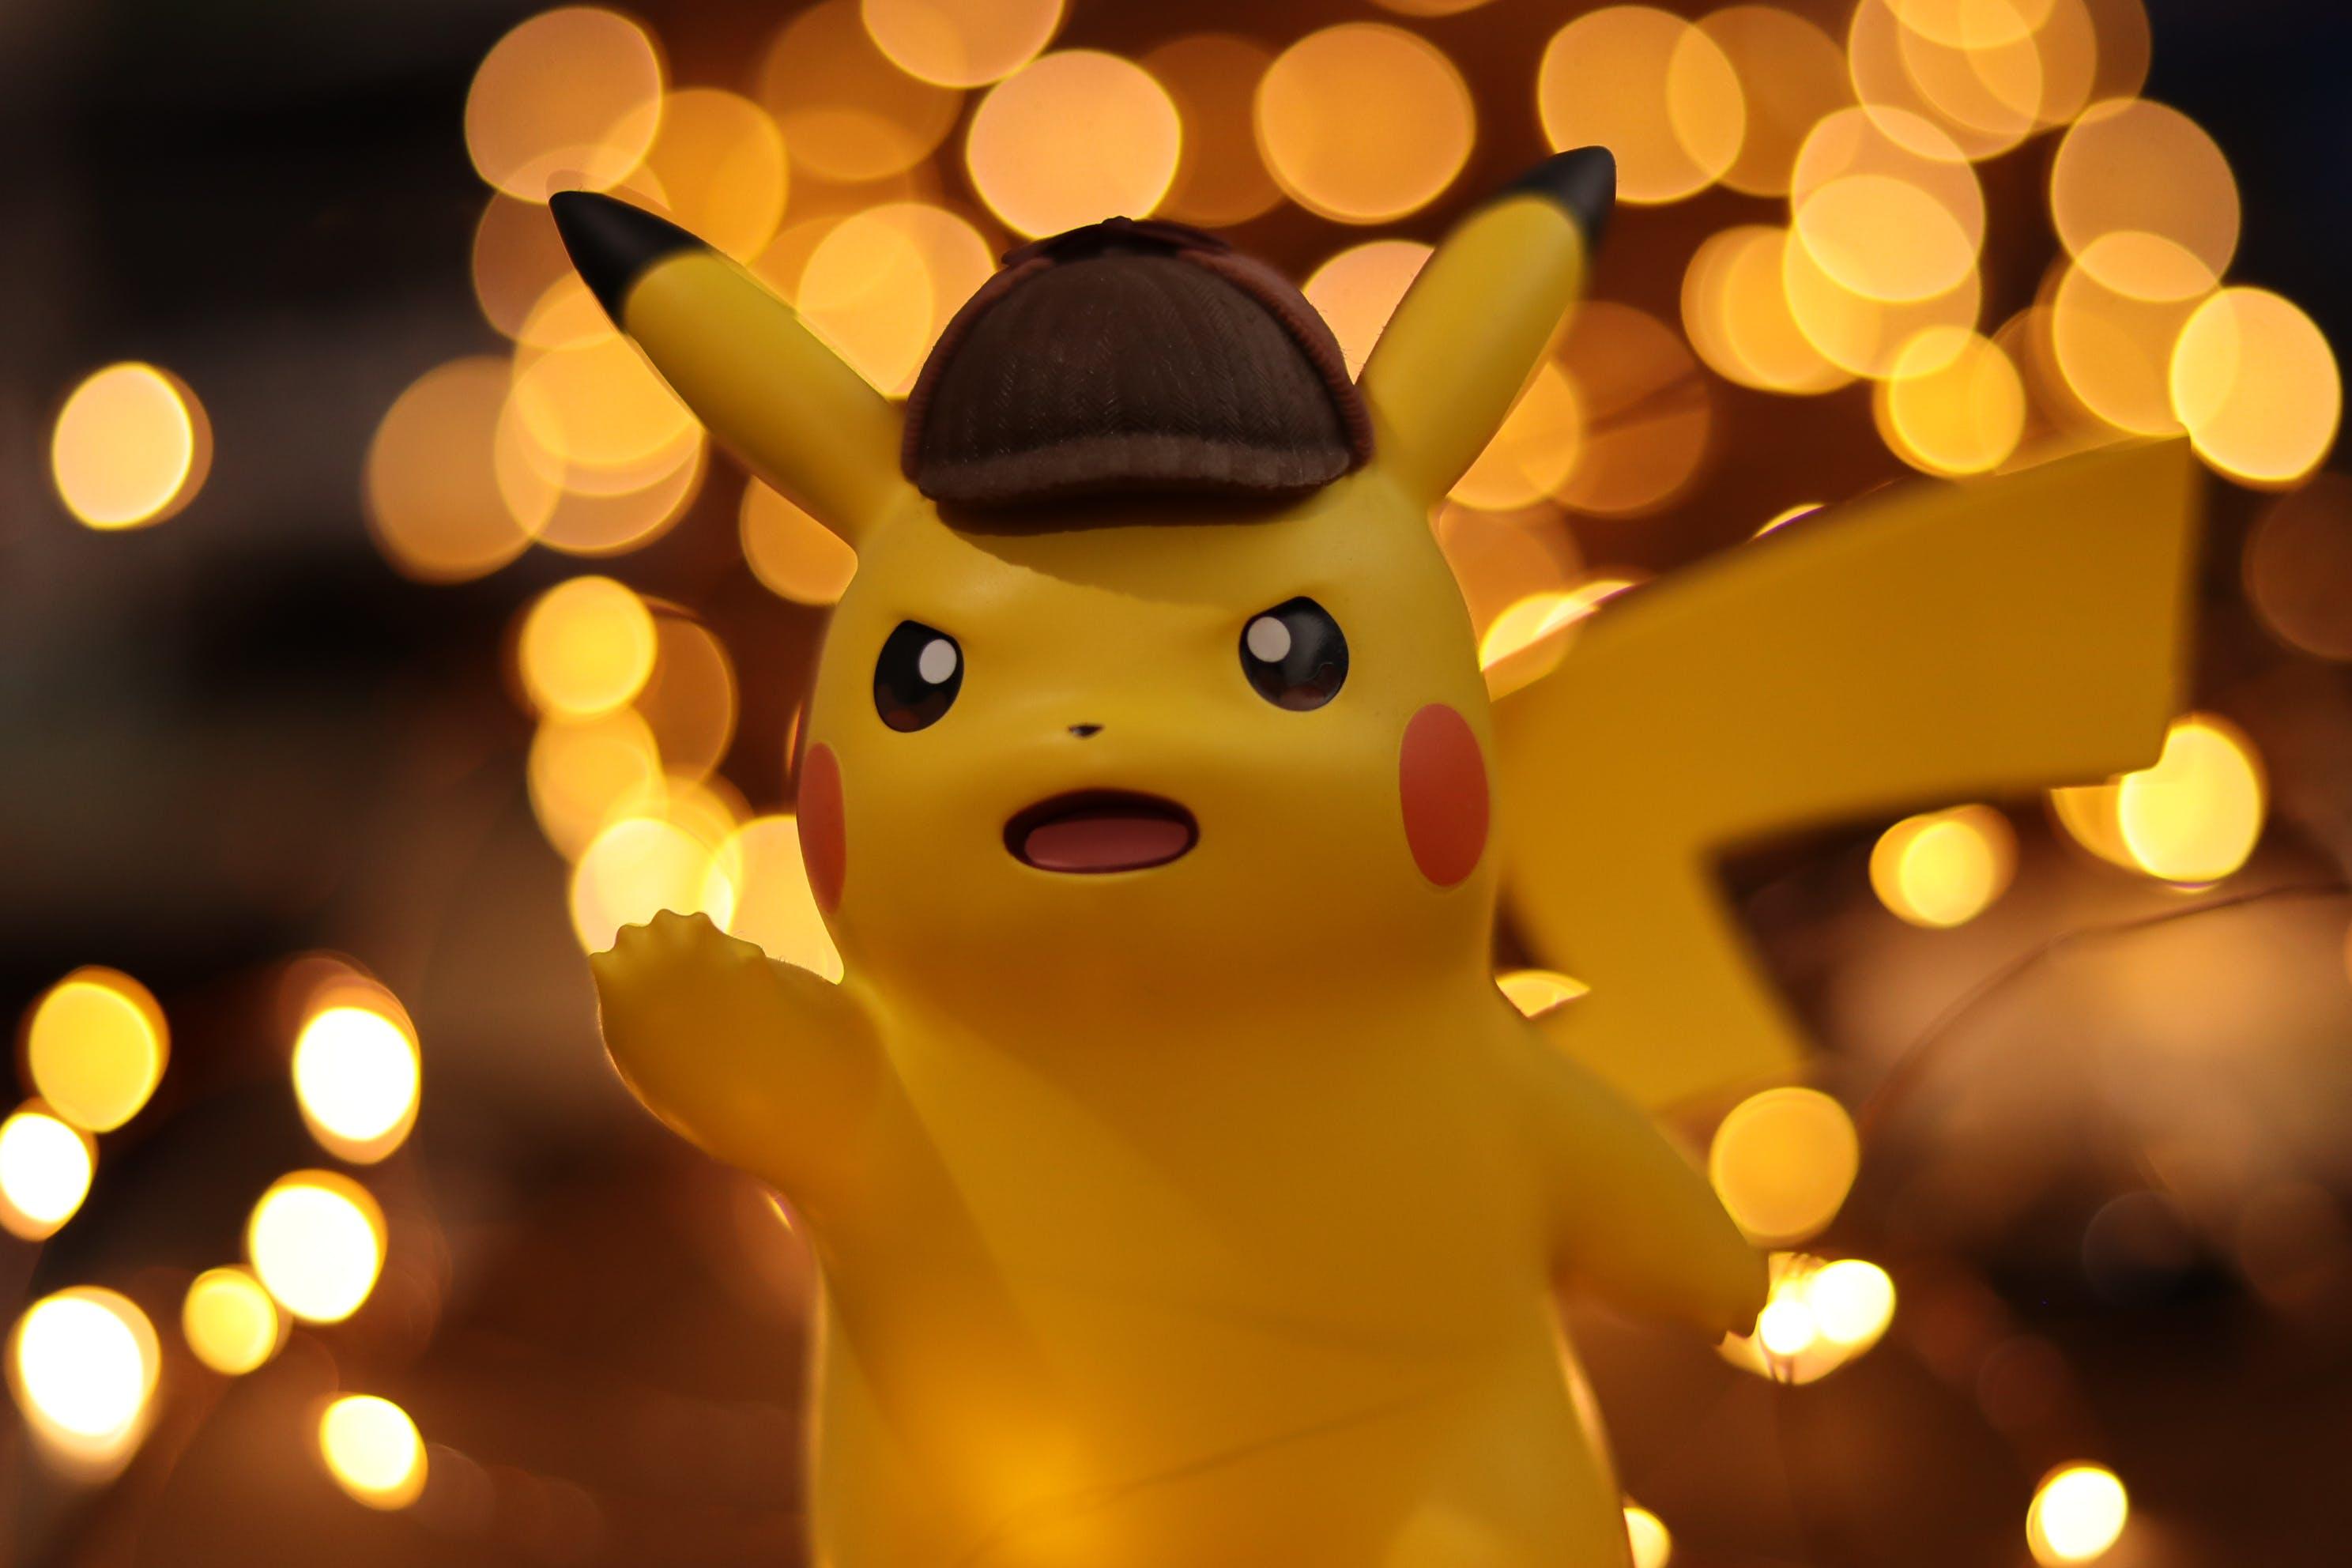 Close-up Photo of Pokemon Pikachu Figurine